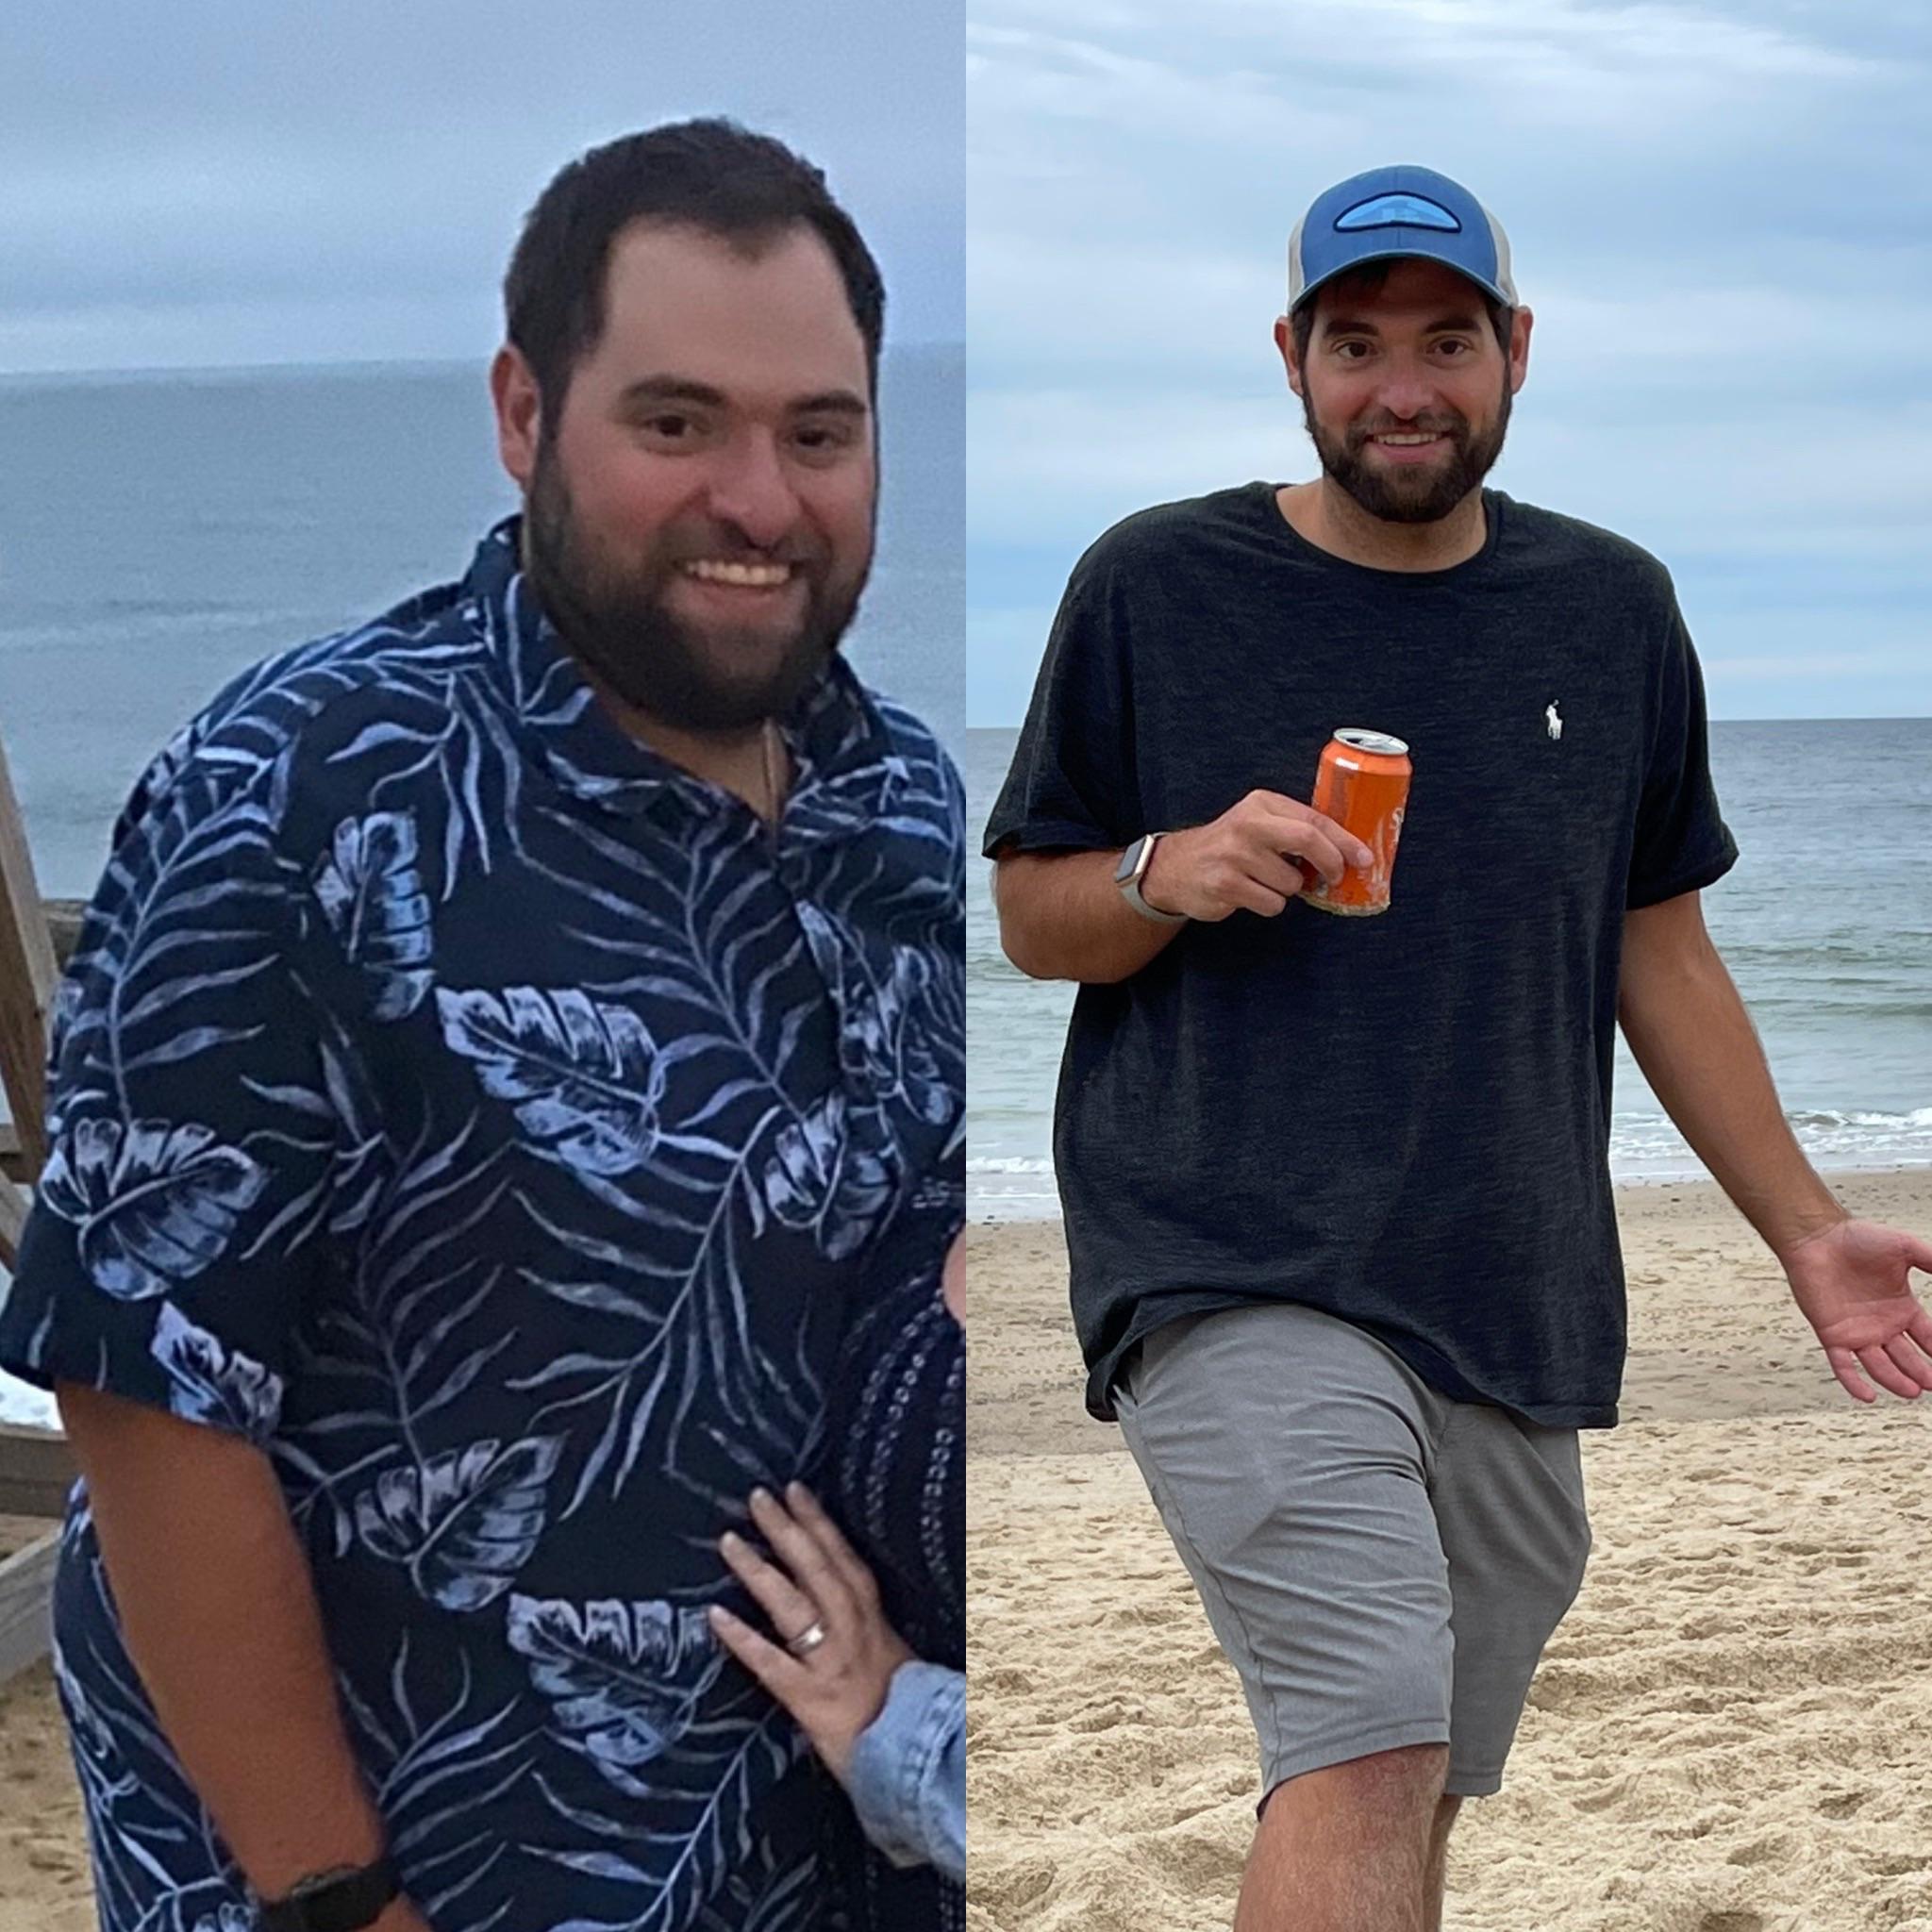 Progress Pics of 100 lbs Weight Loss 5'10 Male 307 lbs to 207 lbs